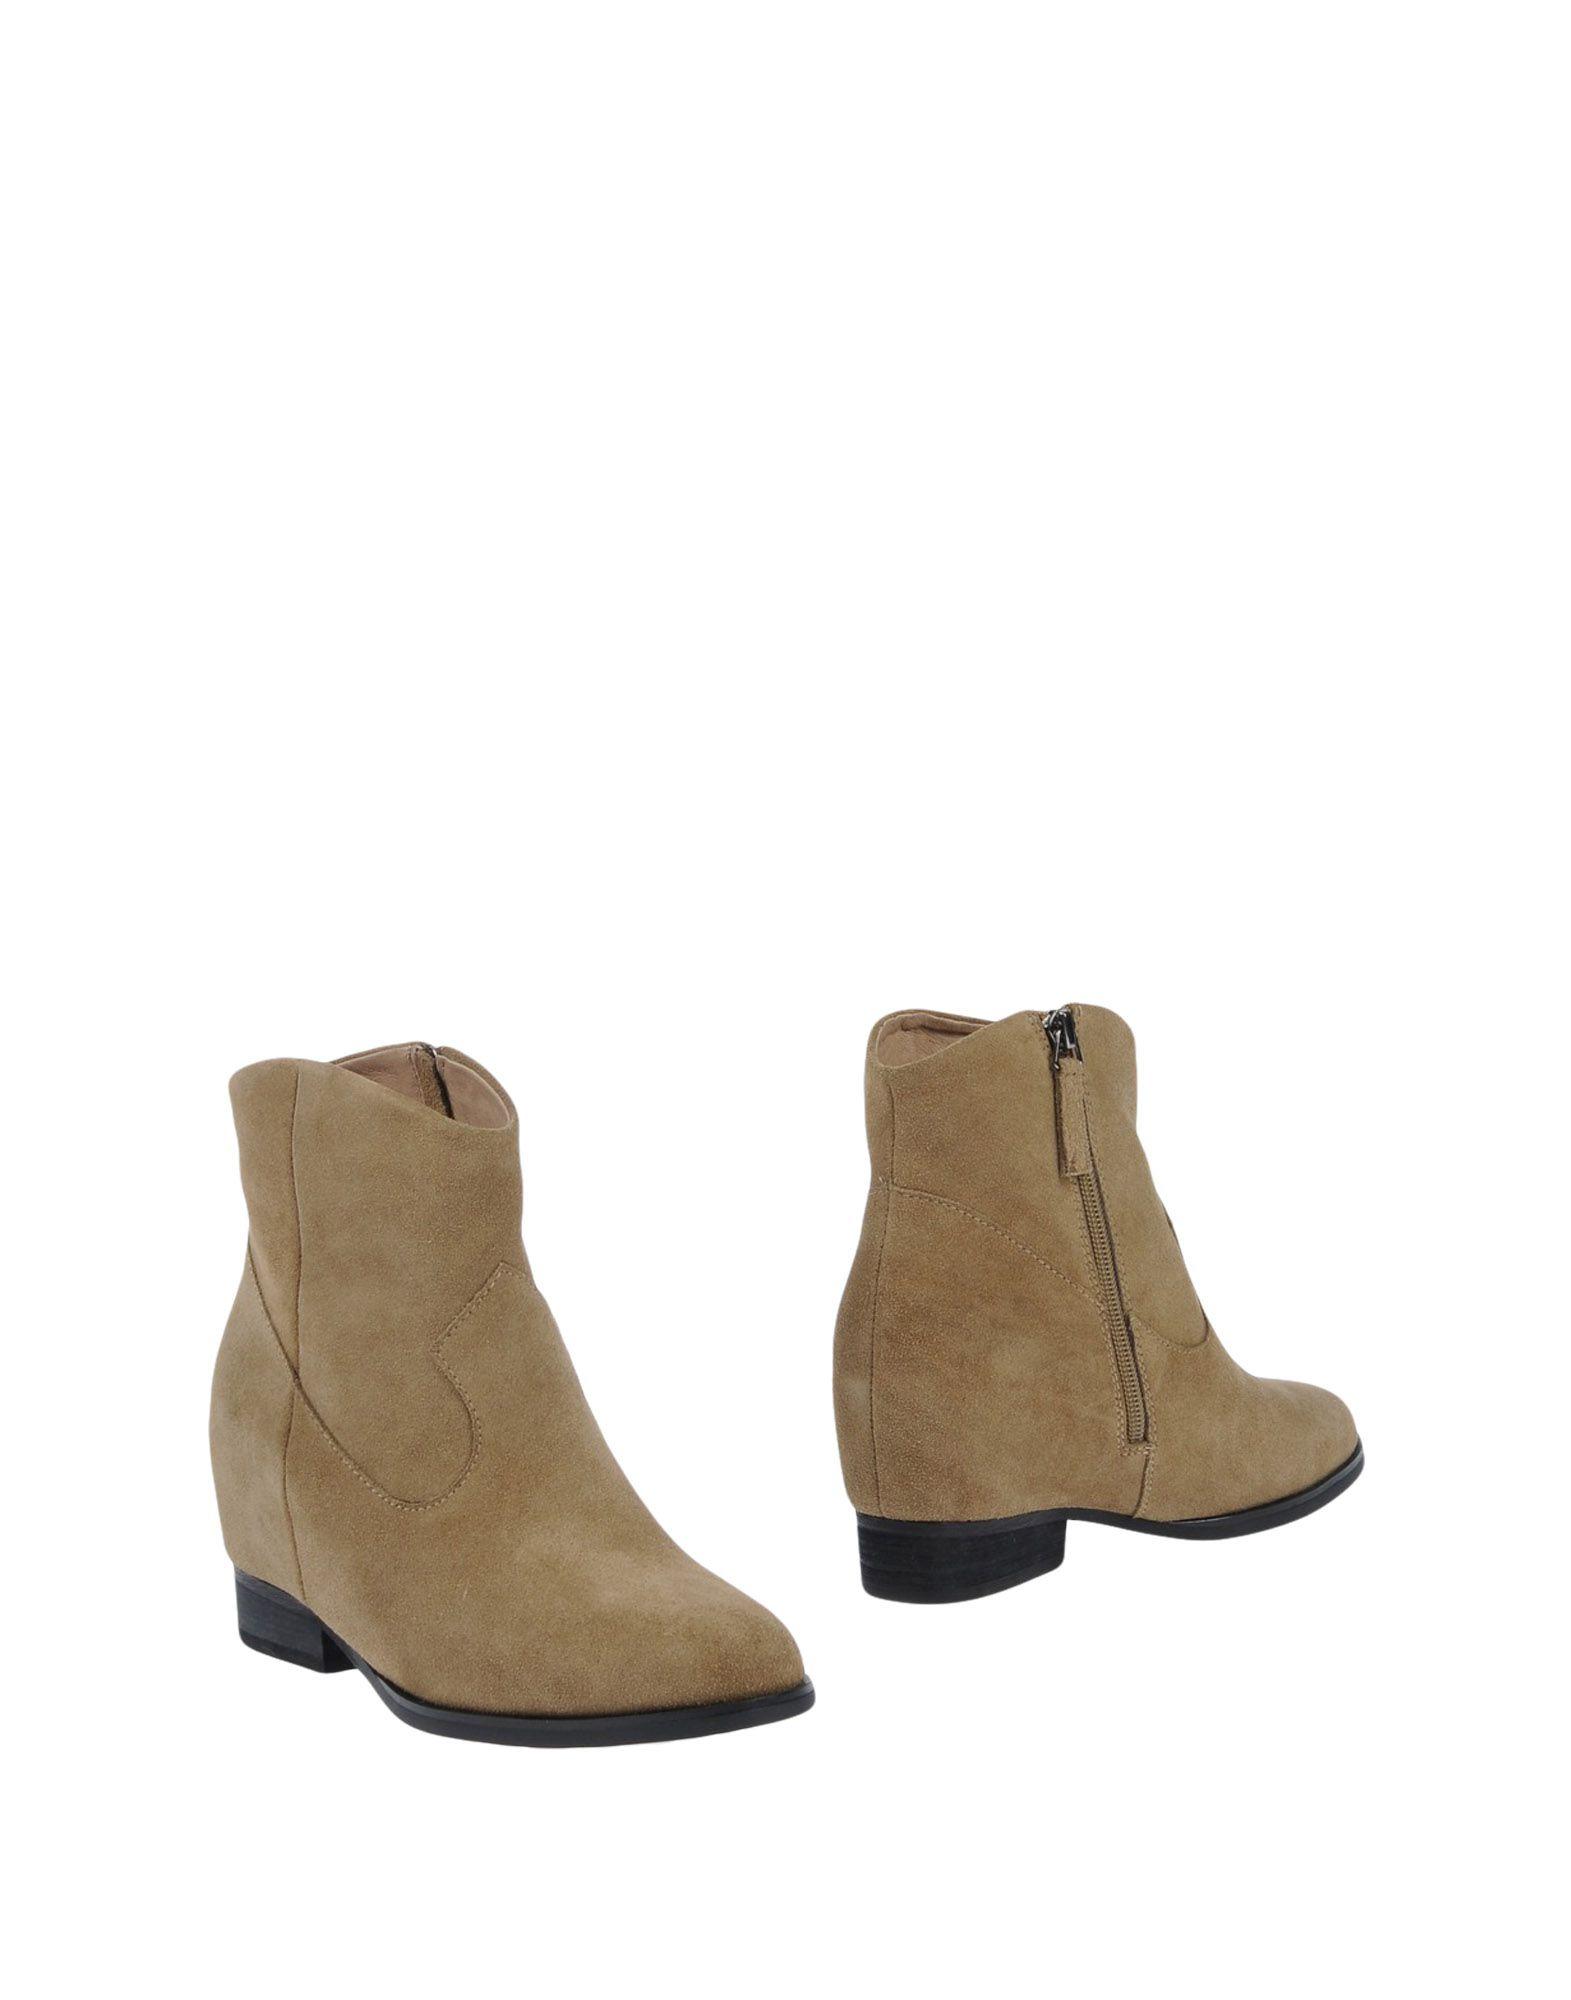 Stilvolle billige Schuhe Damen Mi/Mai Stiefelette Damen Schuhe  11278102FF 836ecd